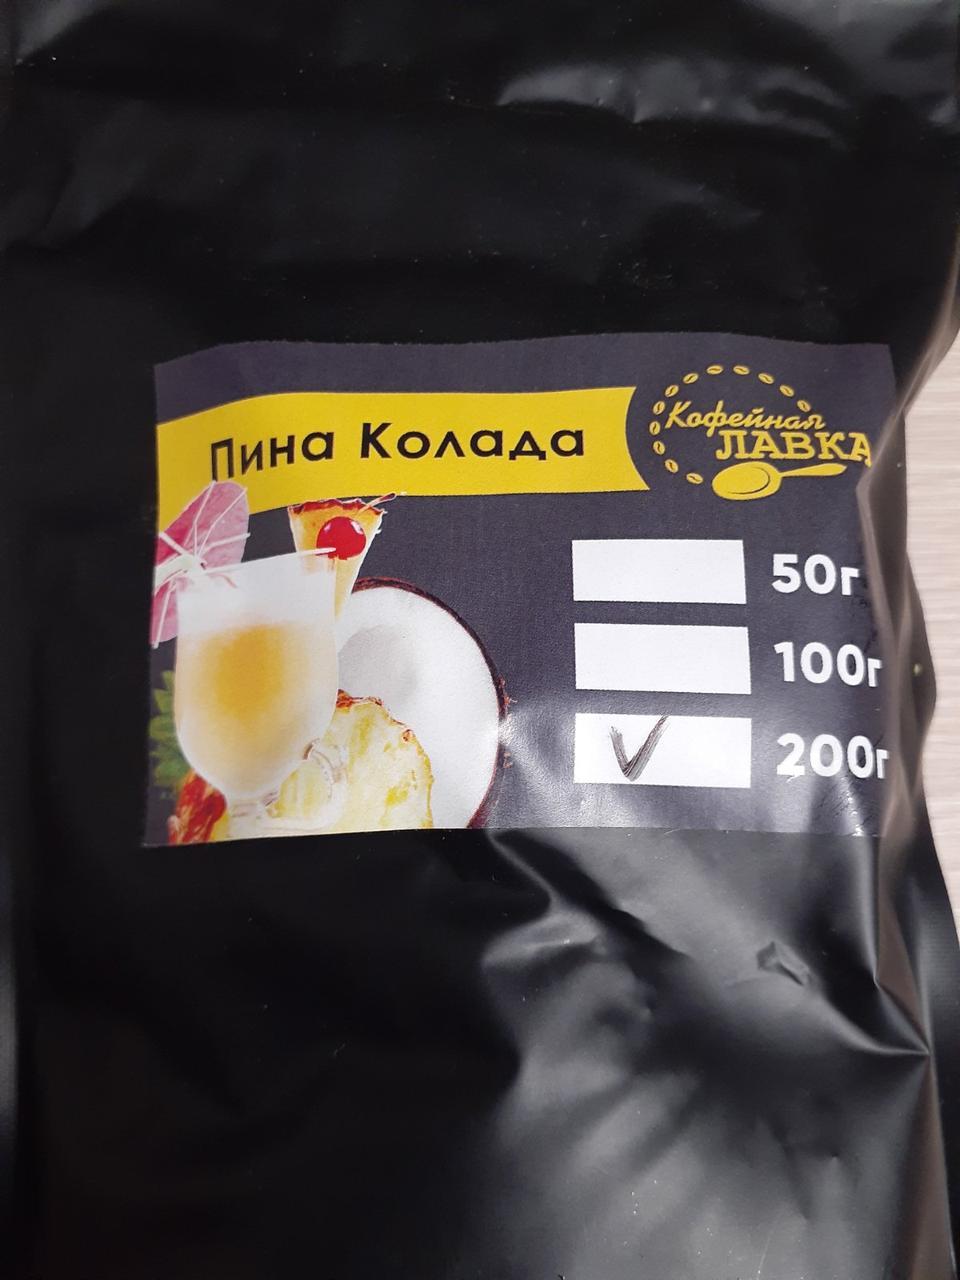 Кофе 100% ARABICA  вкус  Пина Колада БРАЗИЛИЯ 200 грамм